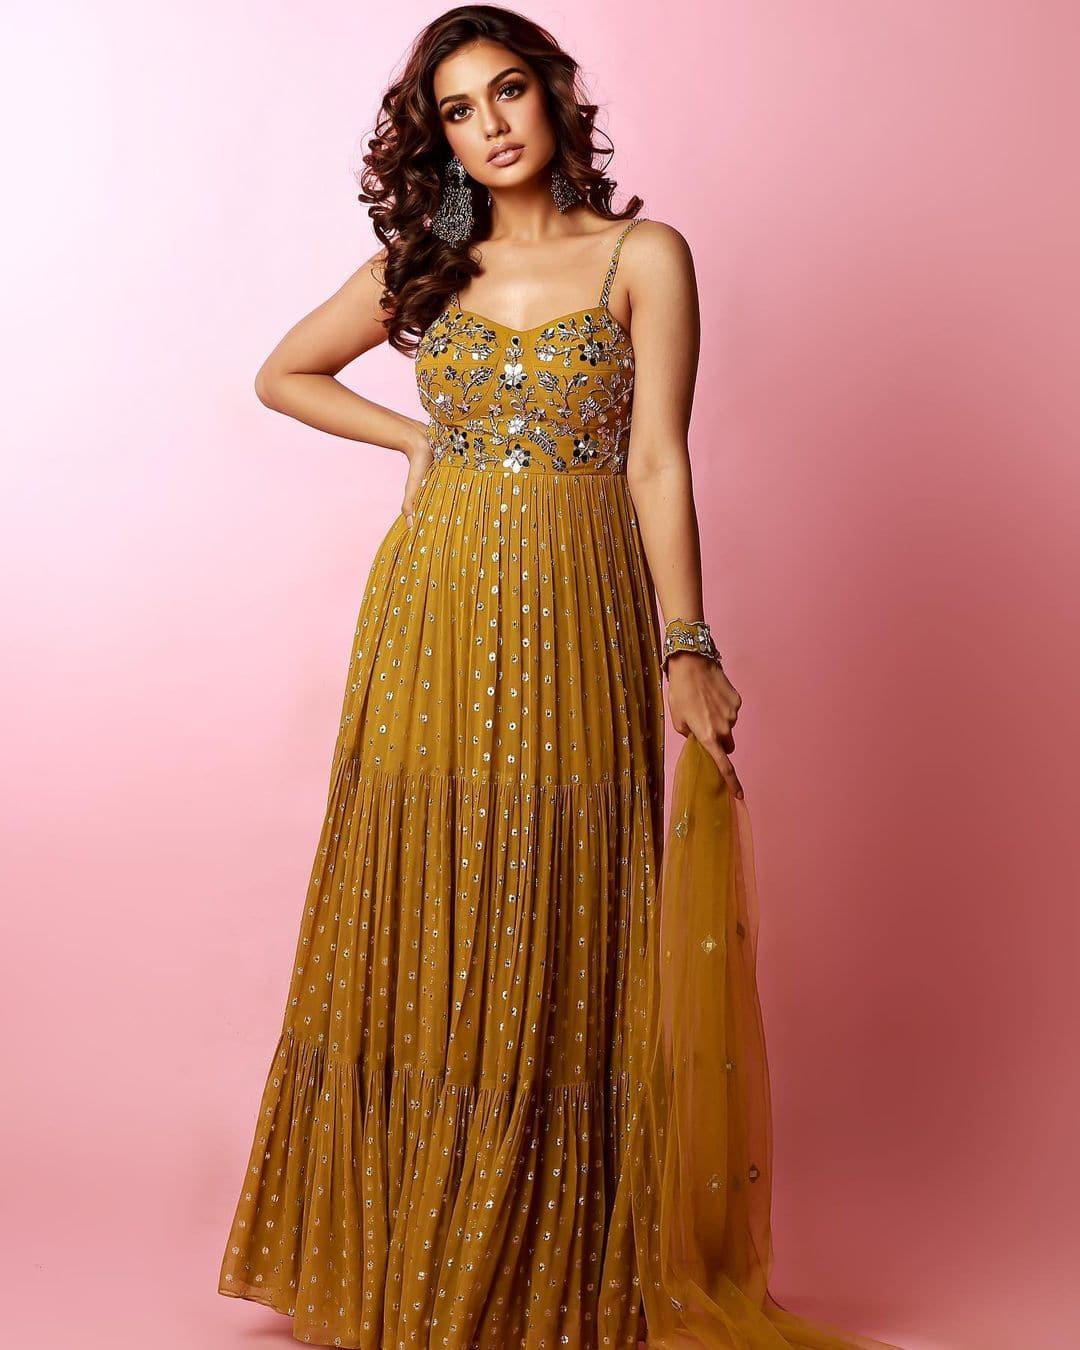 Divya Agarwal looks lovely in a mustard yellow kurta